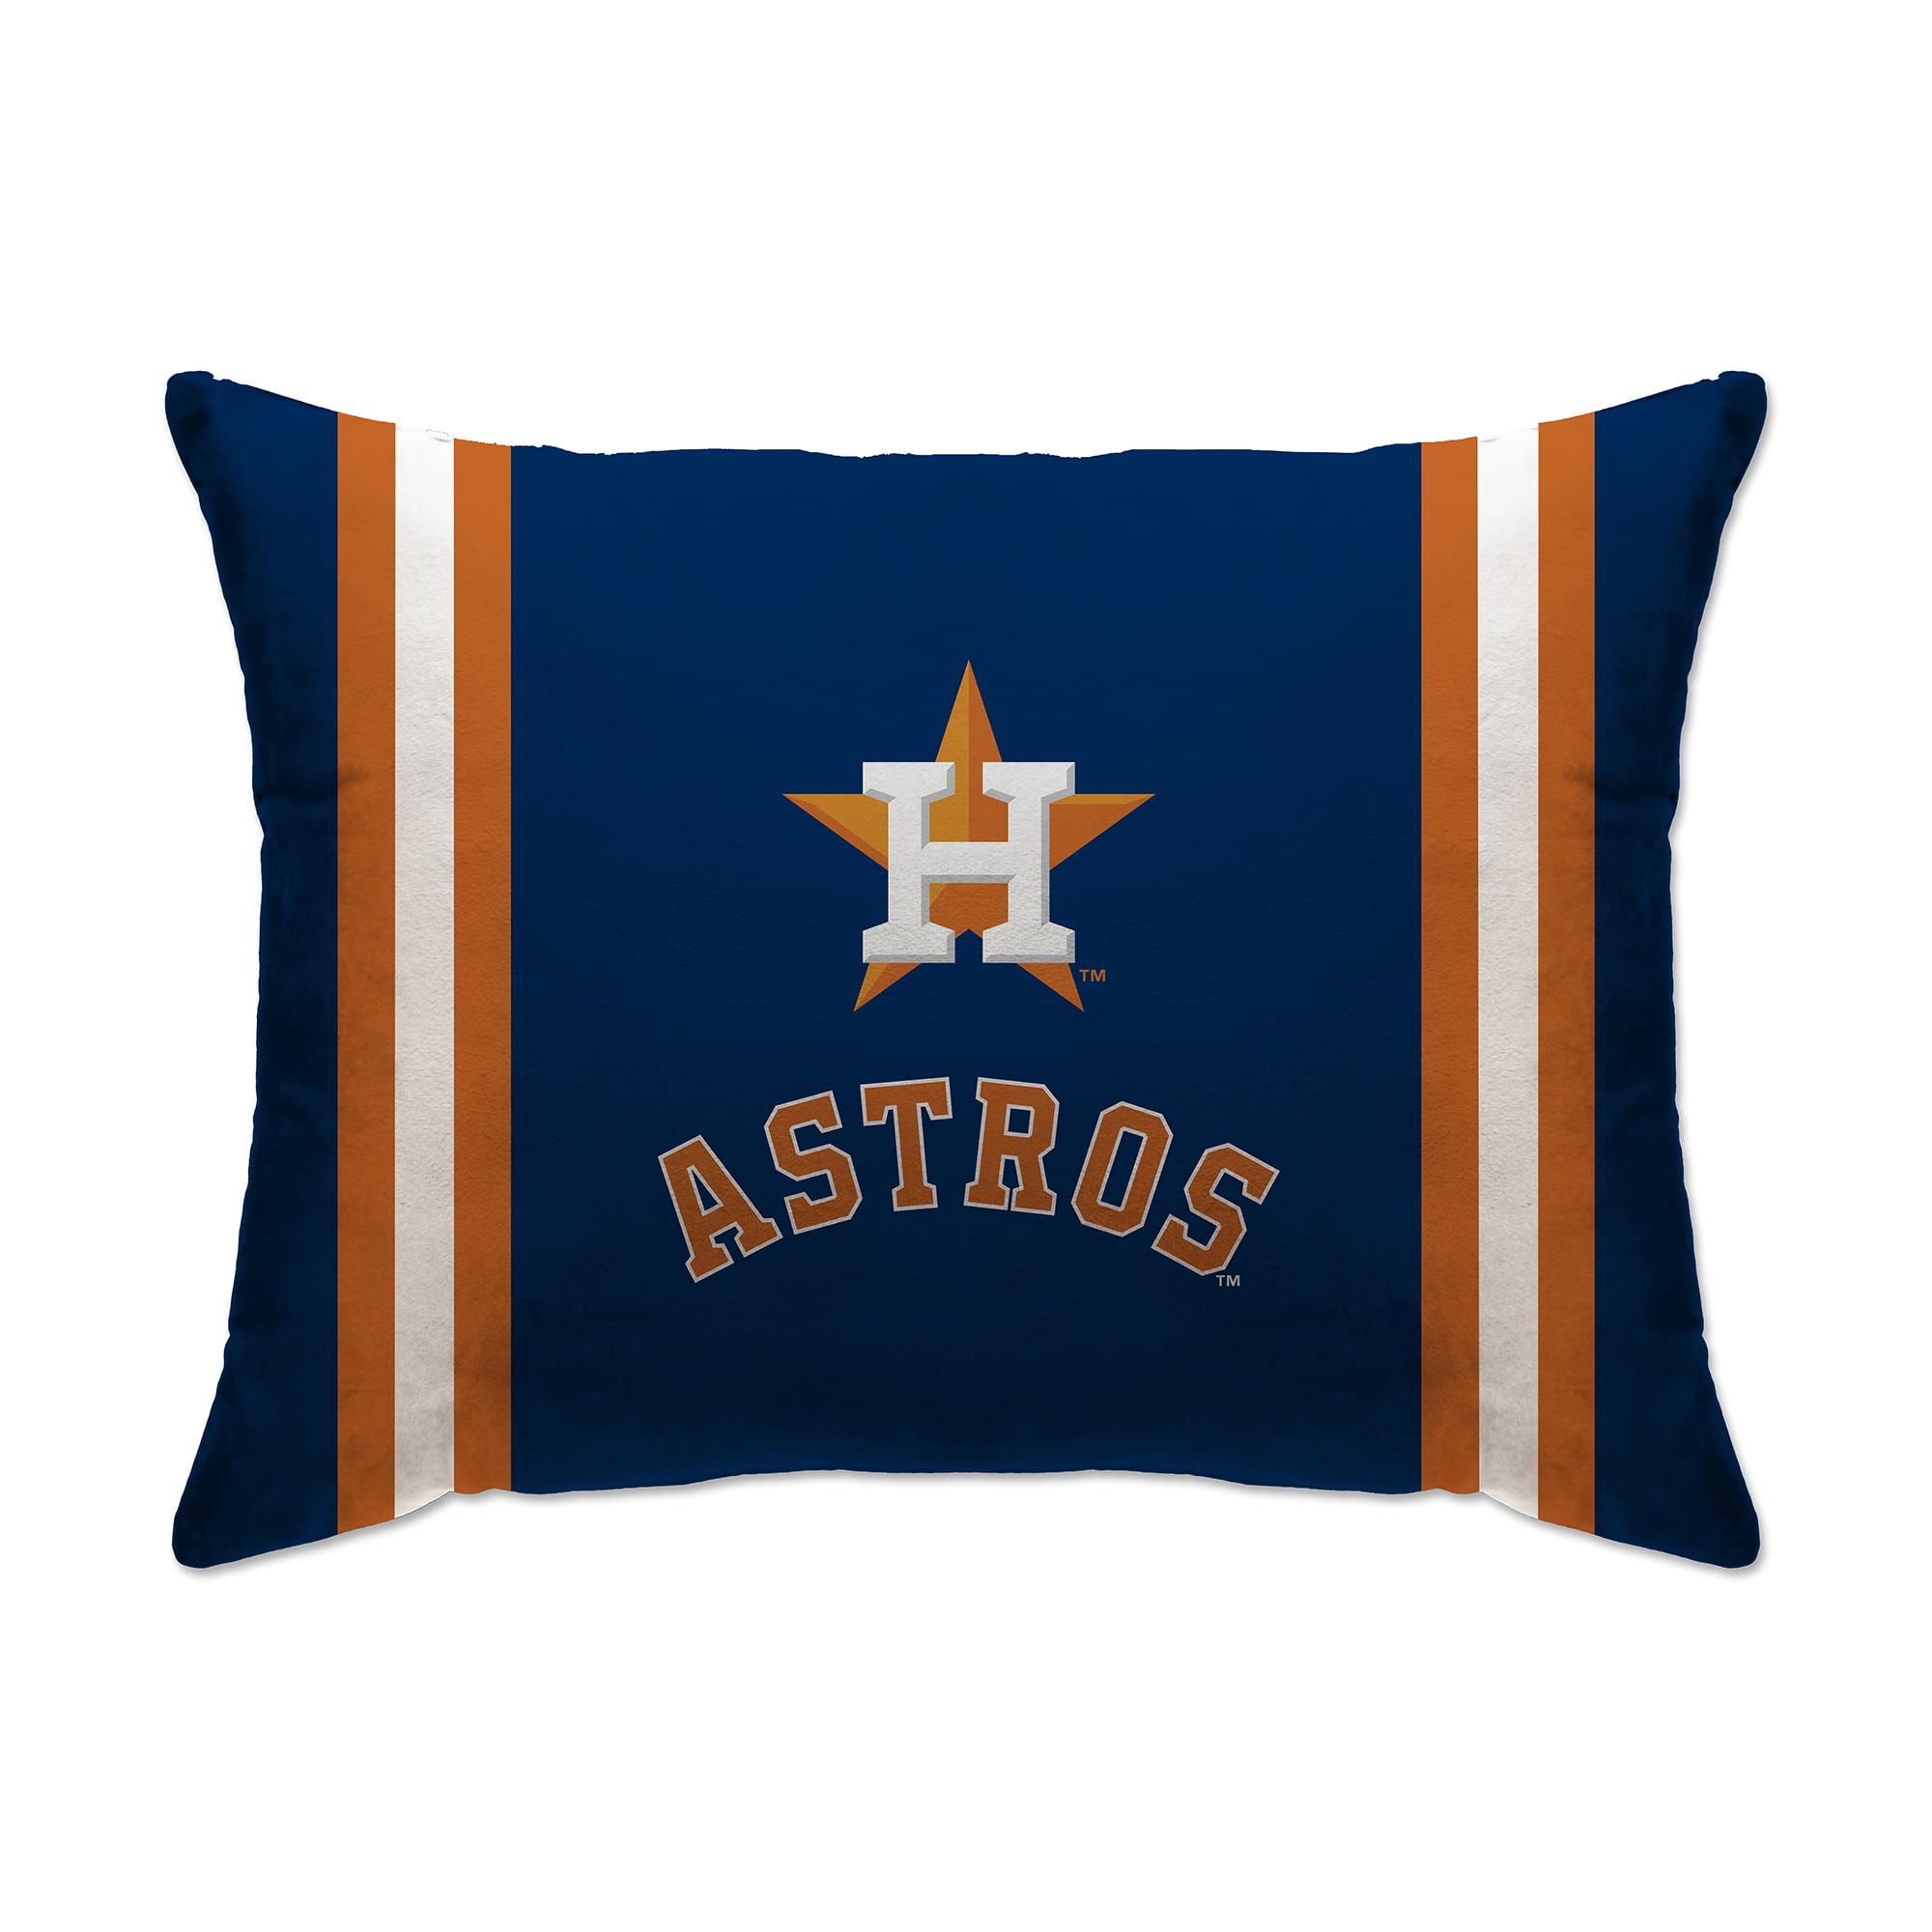 "Houston Astros 20"" x 26"" Plush Bed Pillow - Blue - No Size"